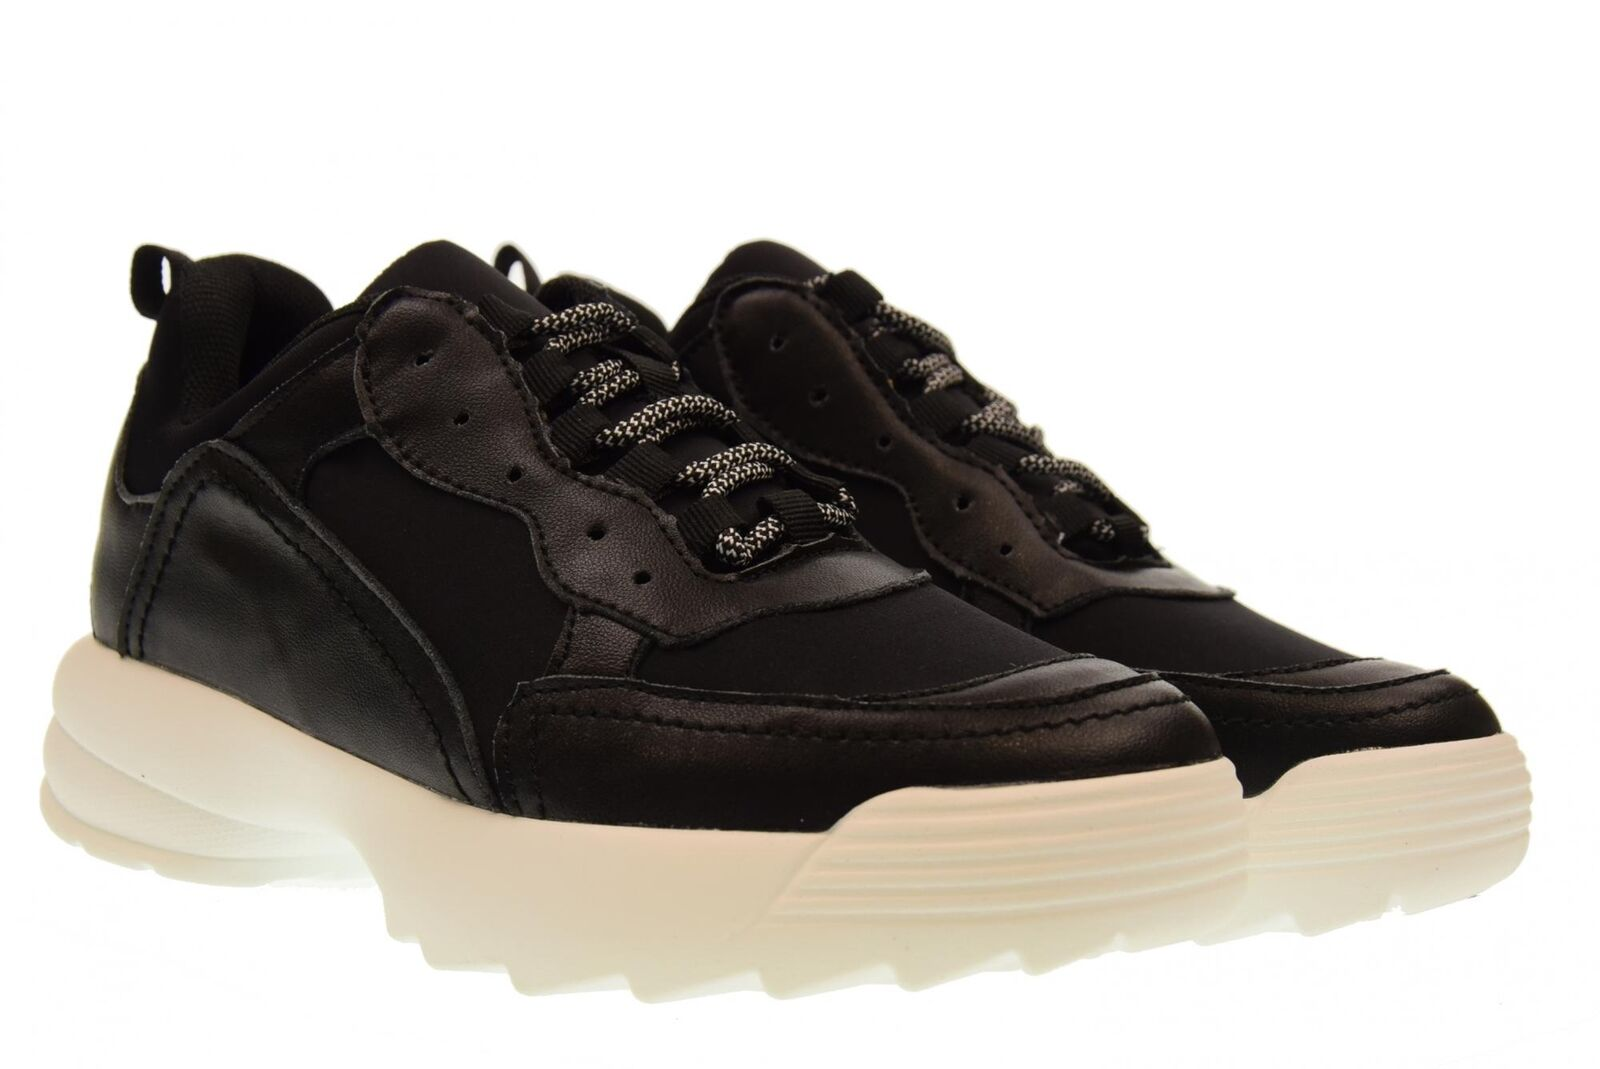 gold&gold A18f shoes femme baskets basses avec plateforme gt531 black